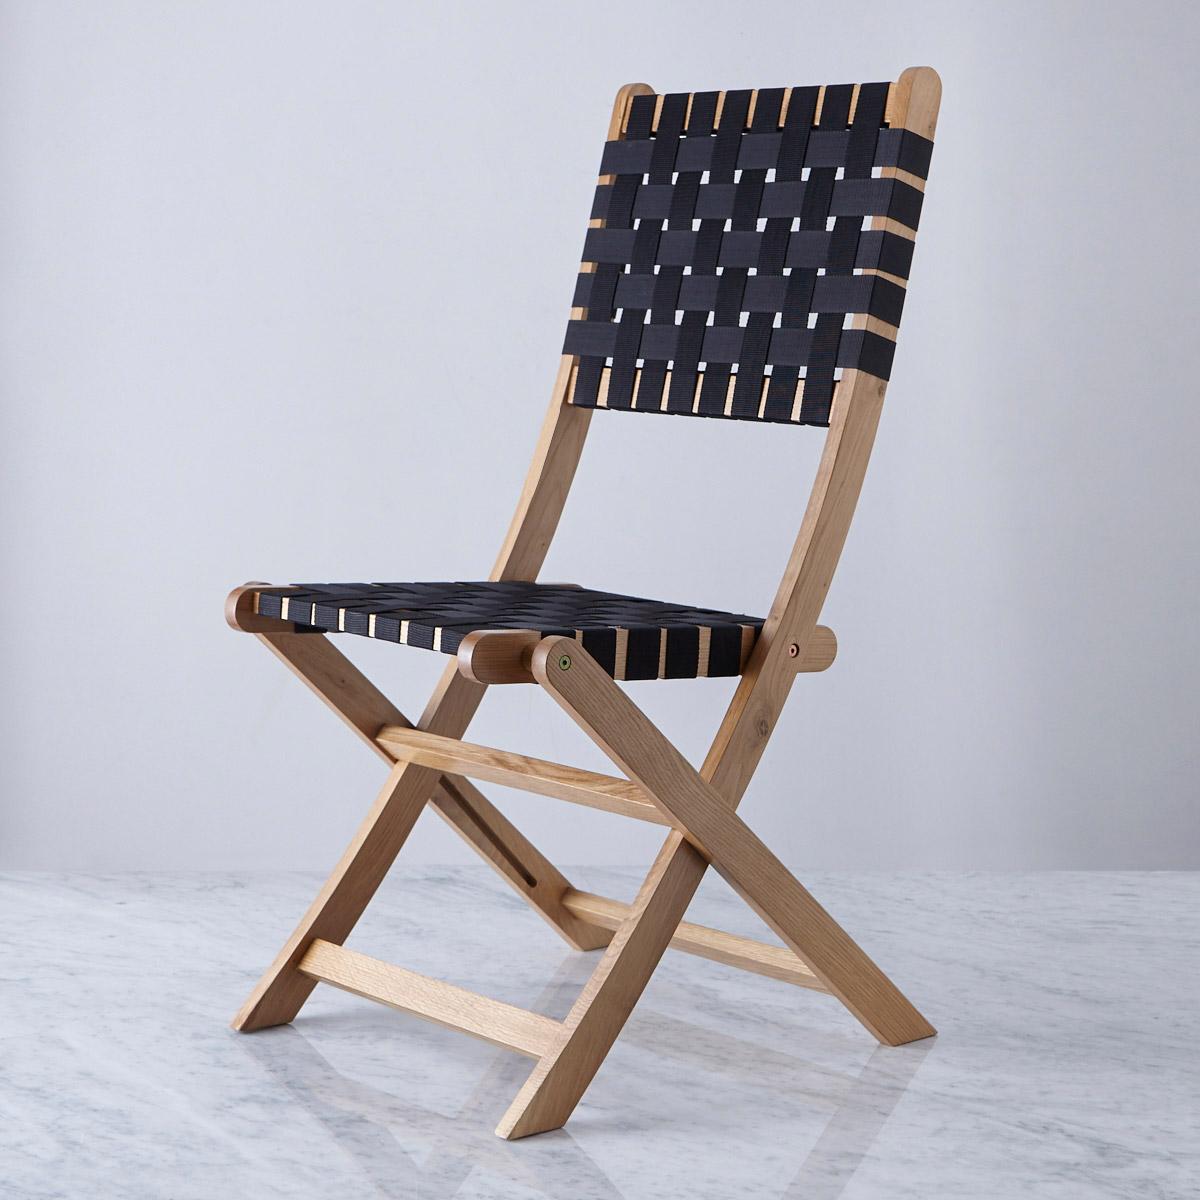 Outstanding Helen James Considered Folding Chair Creativecarmelina Interior Chair Design Creativecarmelinacom